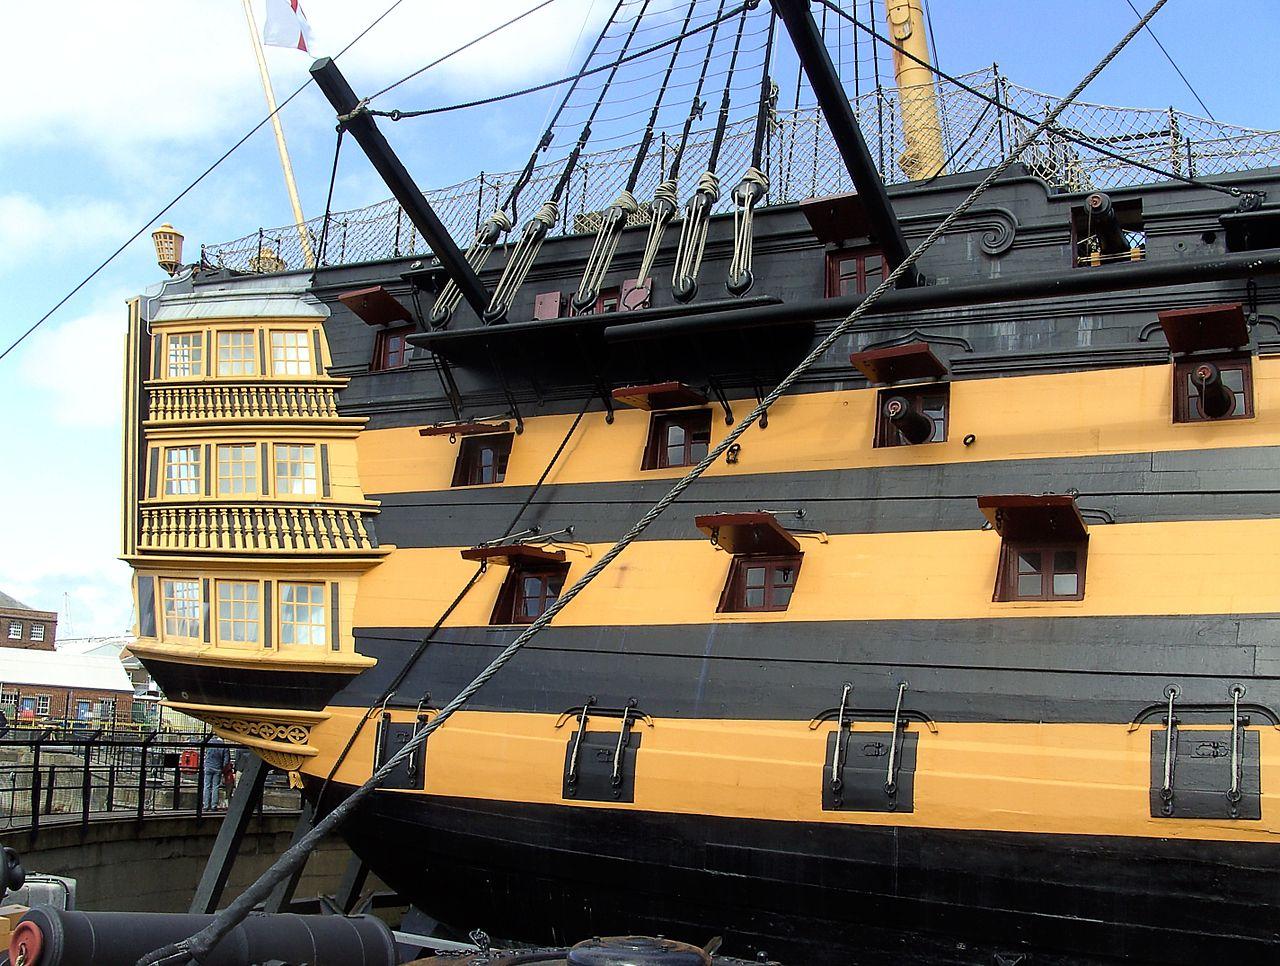 file hms victory ship 1765 view jpg wikimedia